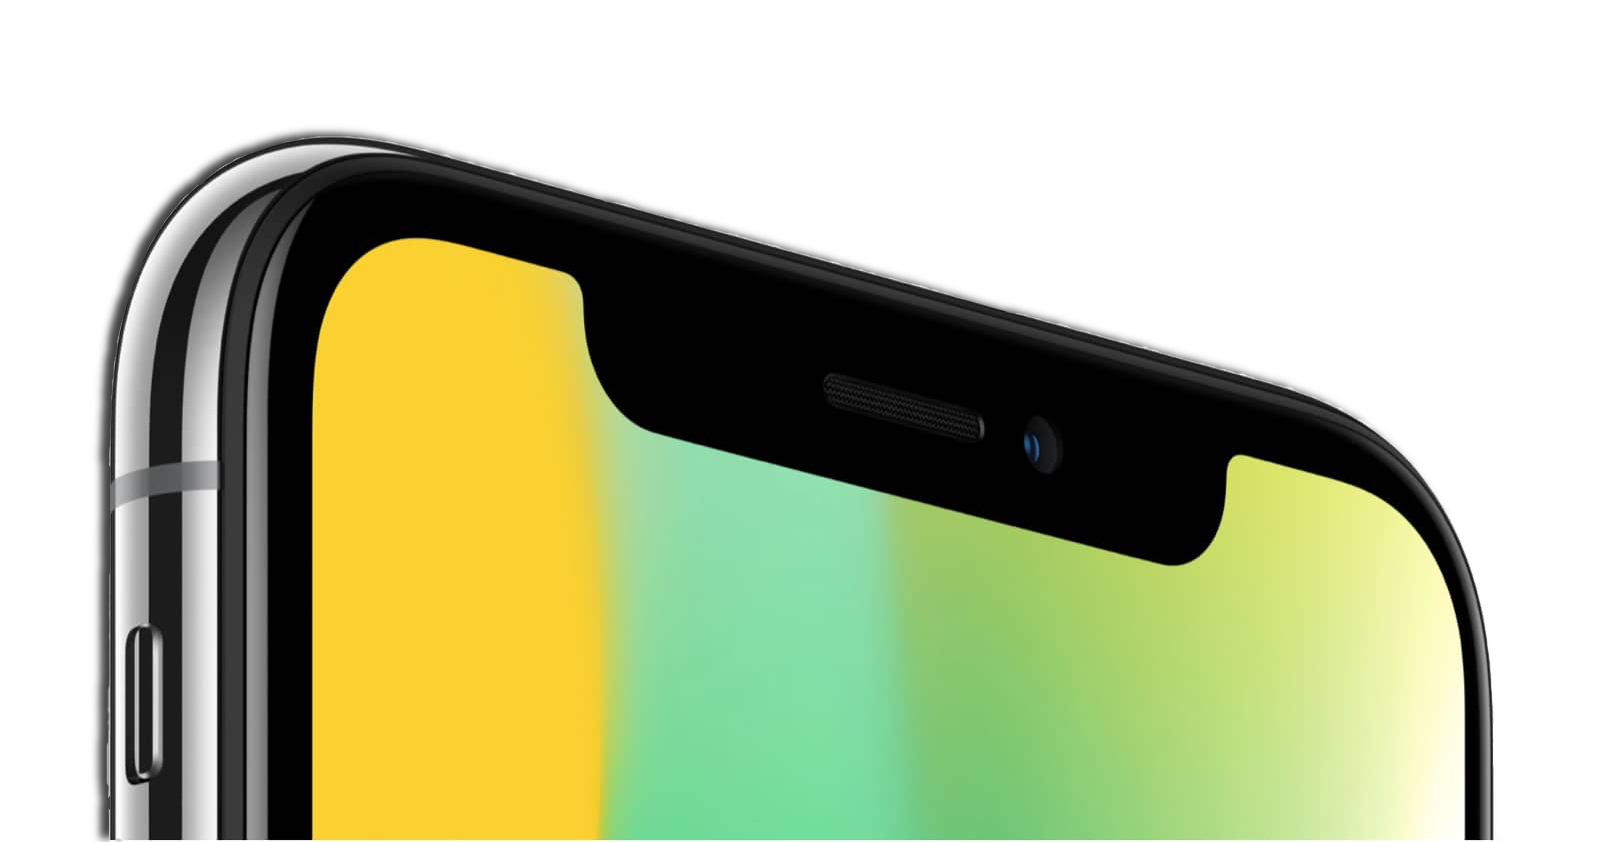 truedepth-new-iphone-camera-features-3.jpg